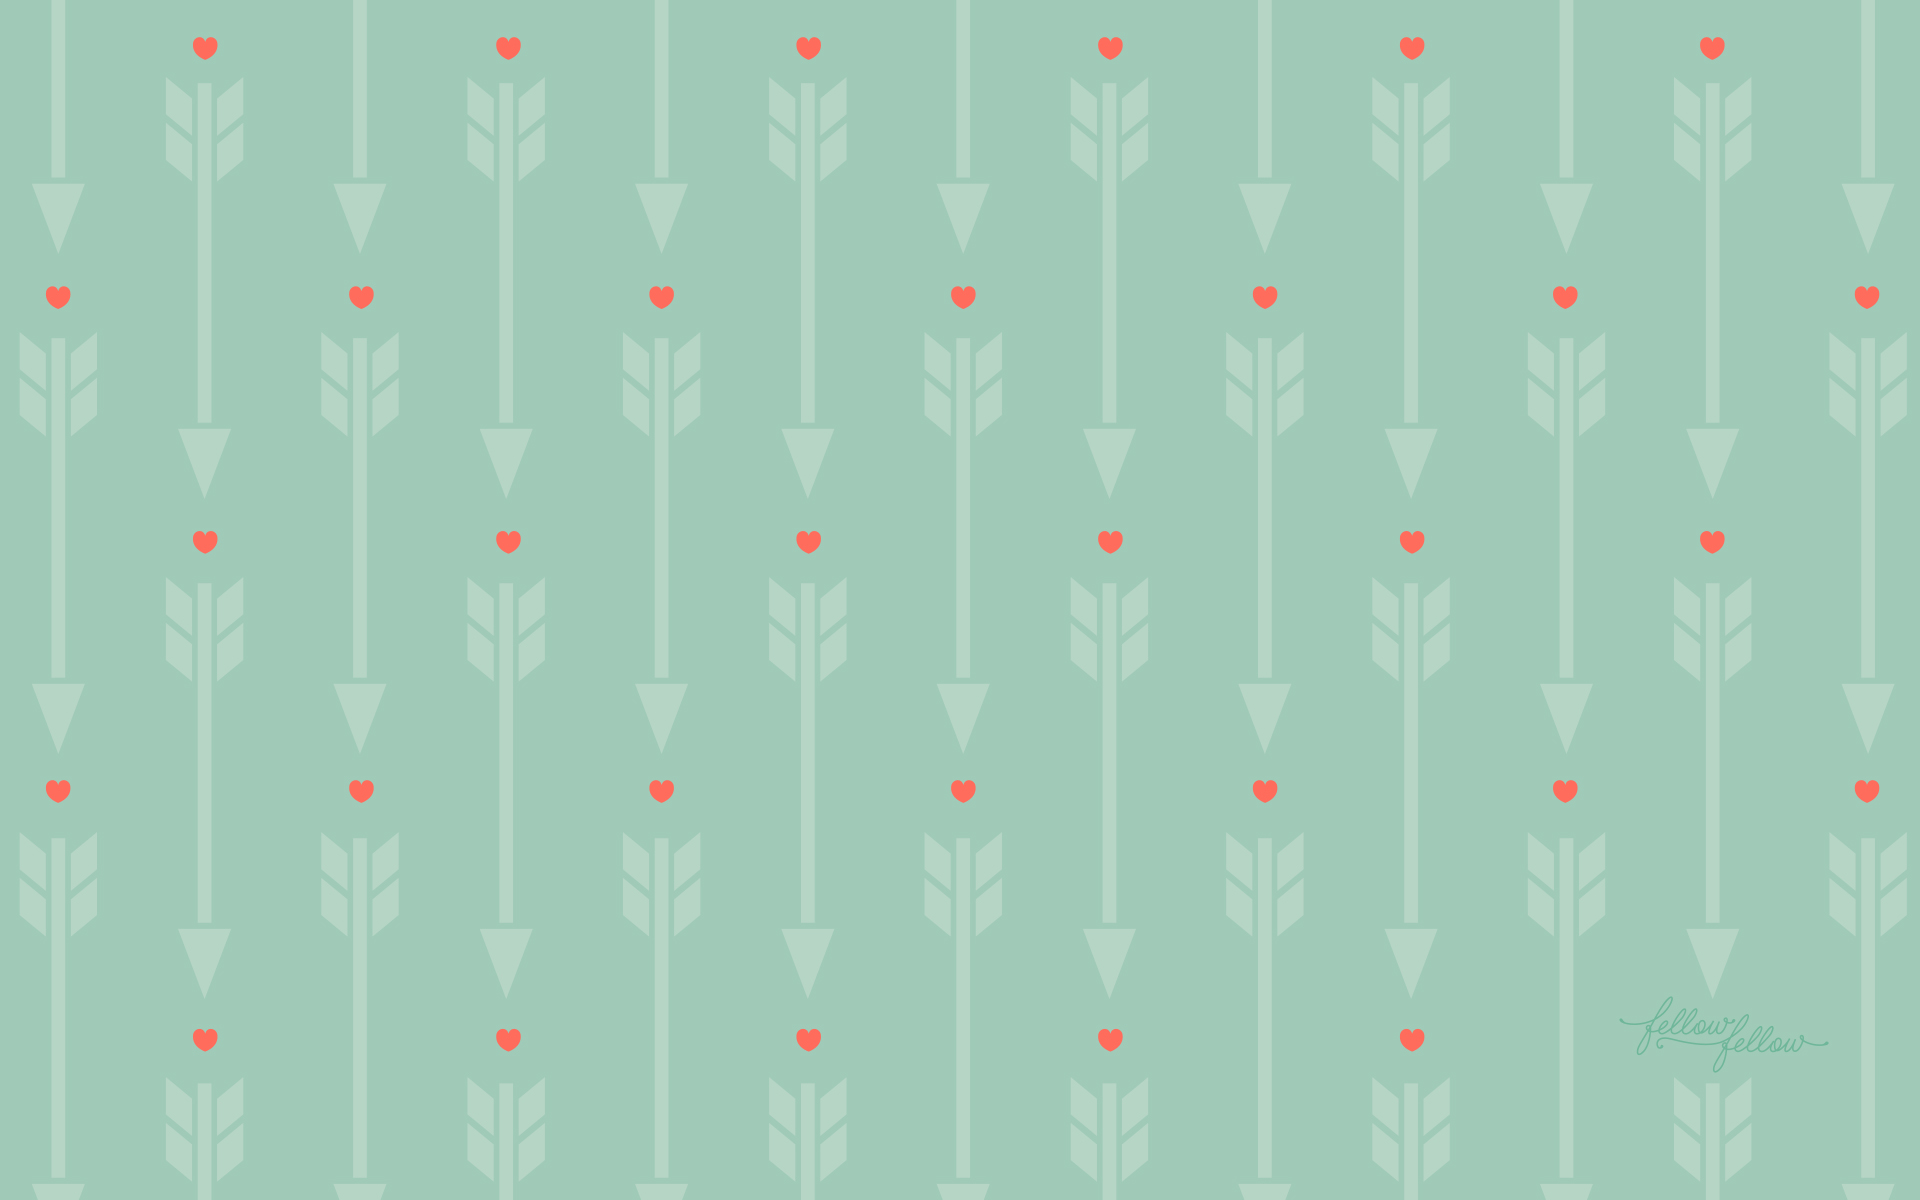 wallpaper modern arrows 1920x1200 1920x1200